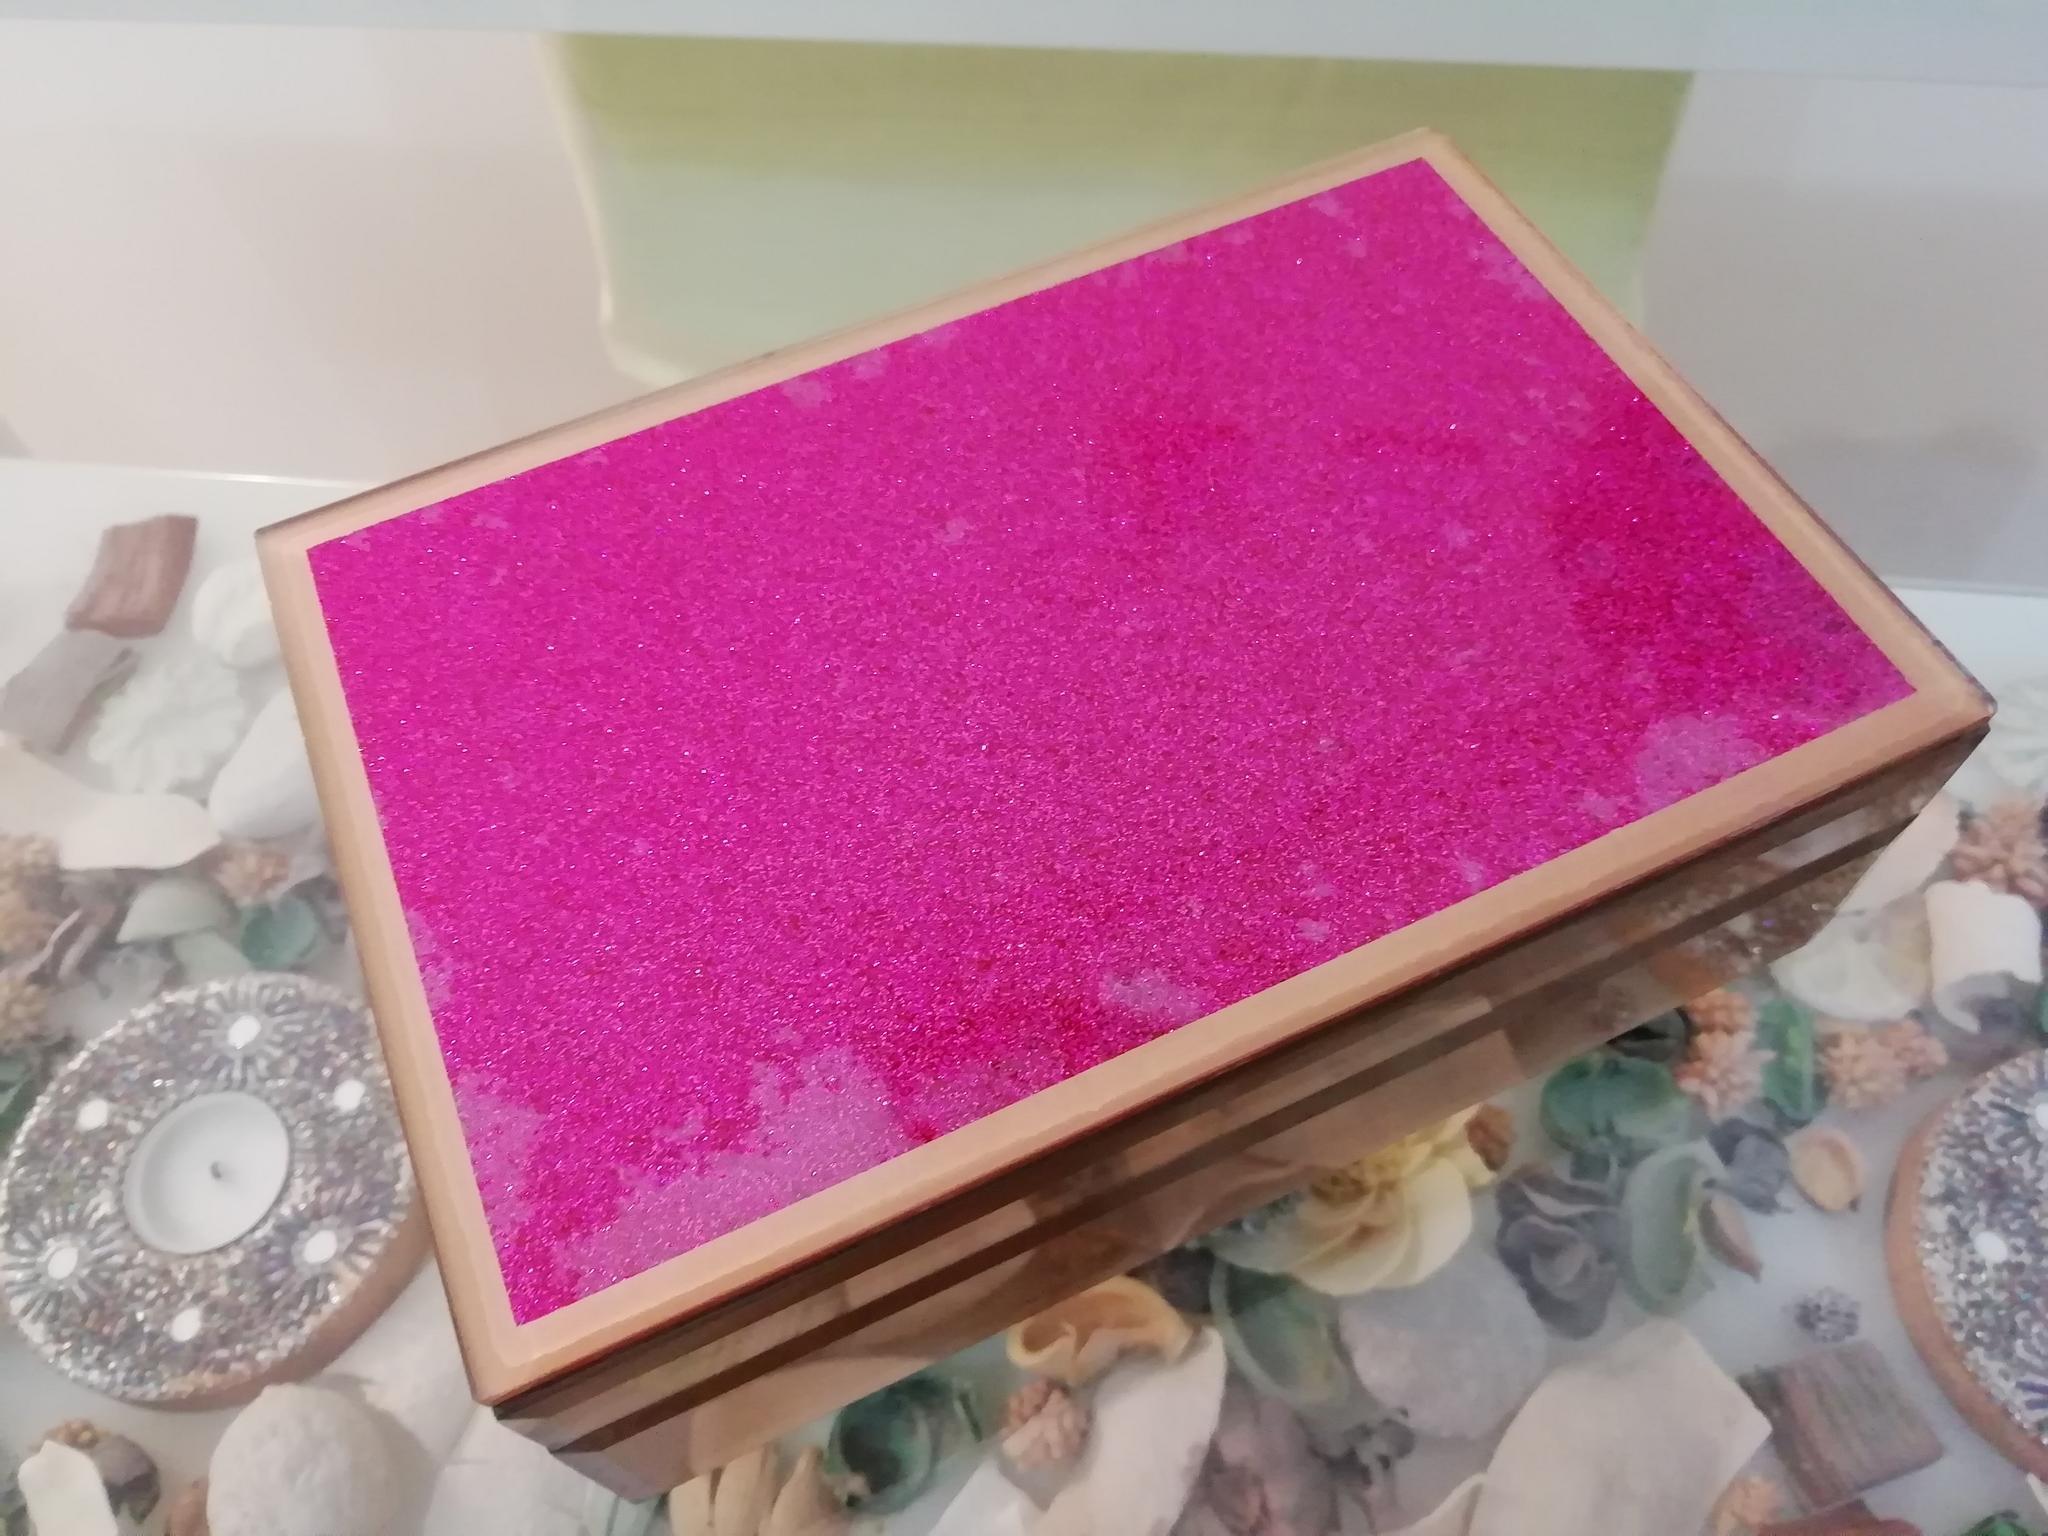 LIFE STYLE LUXURY-JEWELRY BOX- PURPLE COLOR